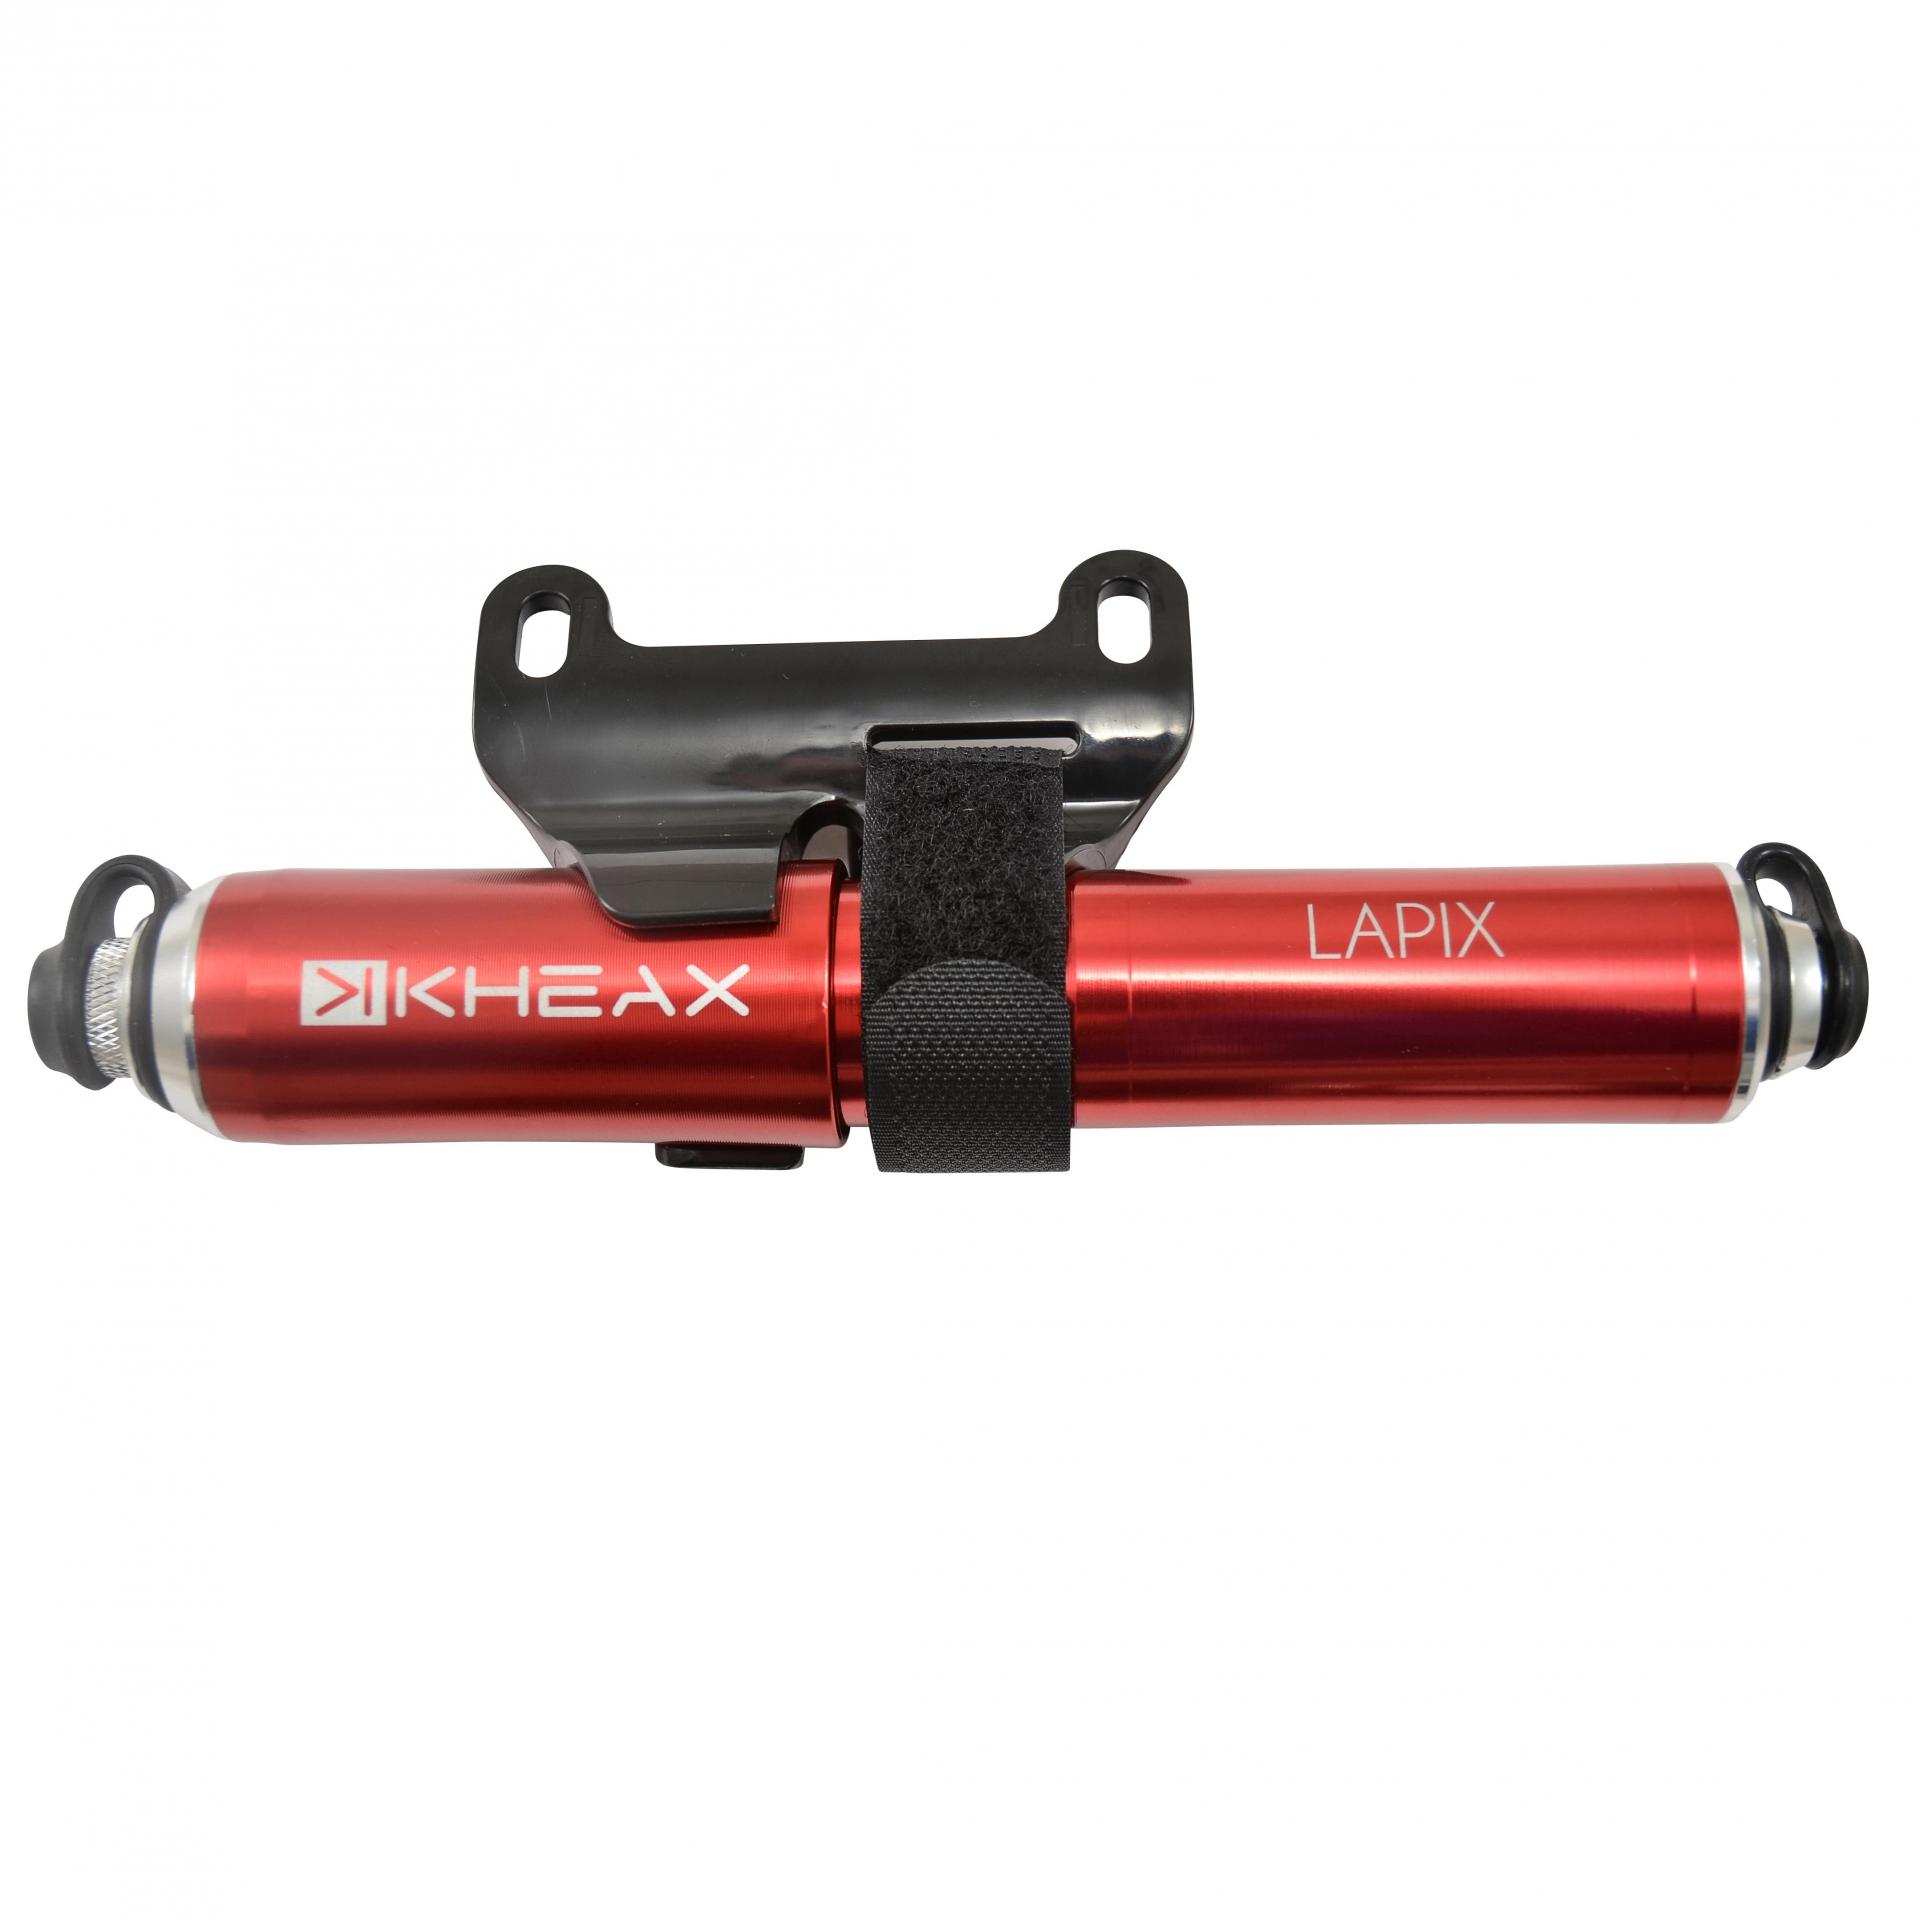 Mini pompe KHEAX Lapix VTT S Rouge (185 mm)